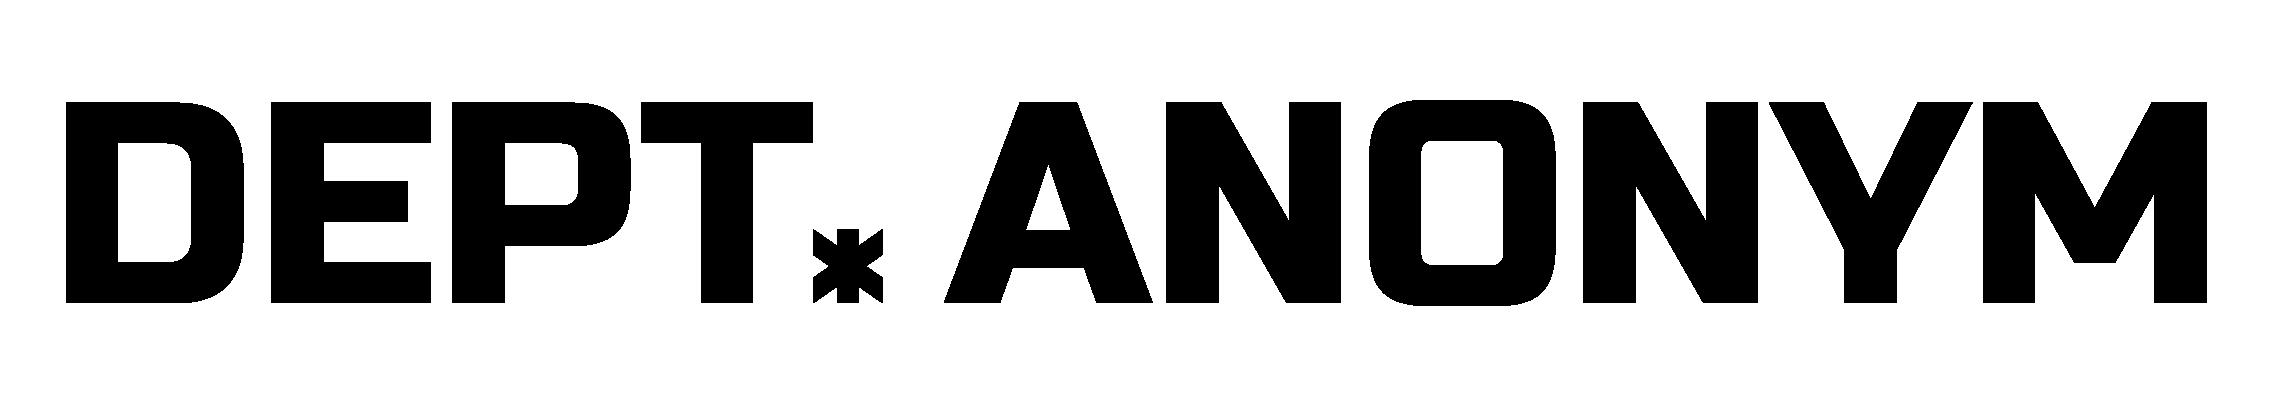 DEPT.ANONYM